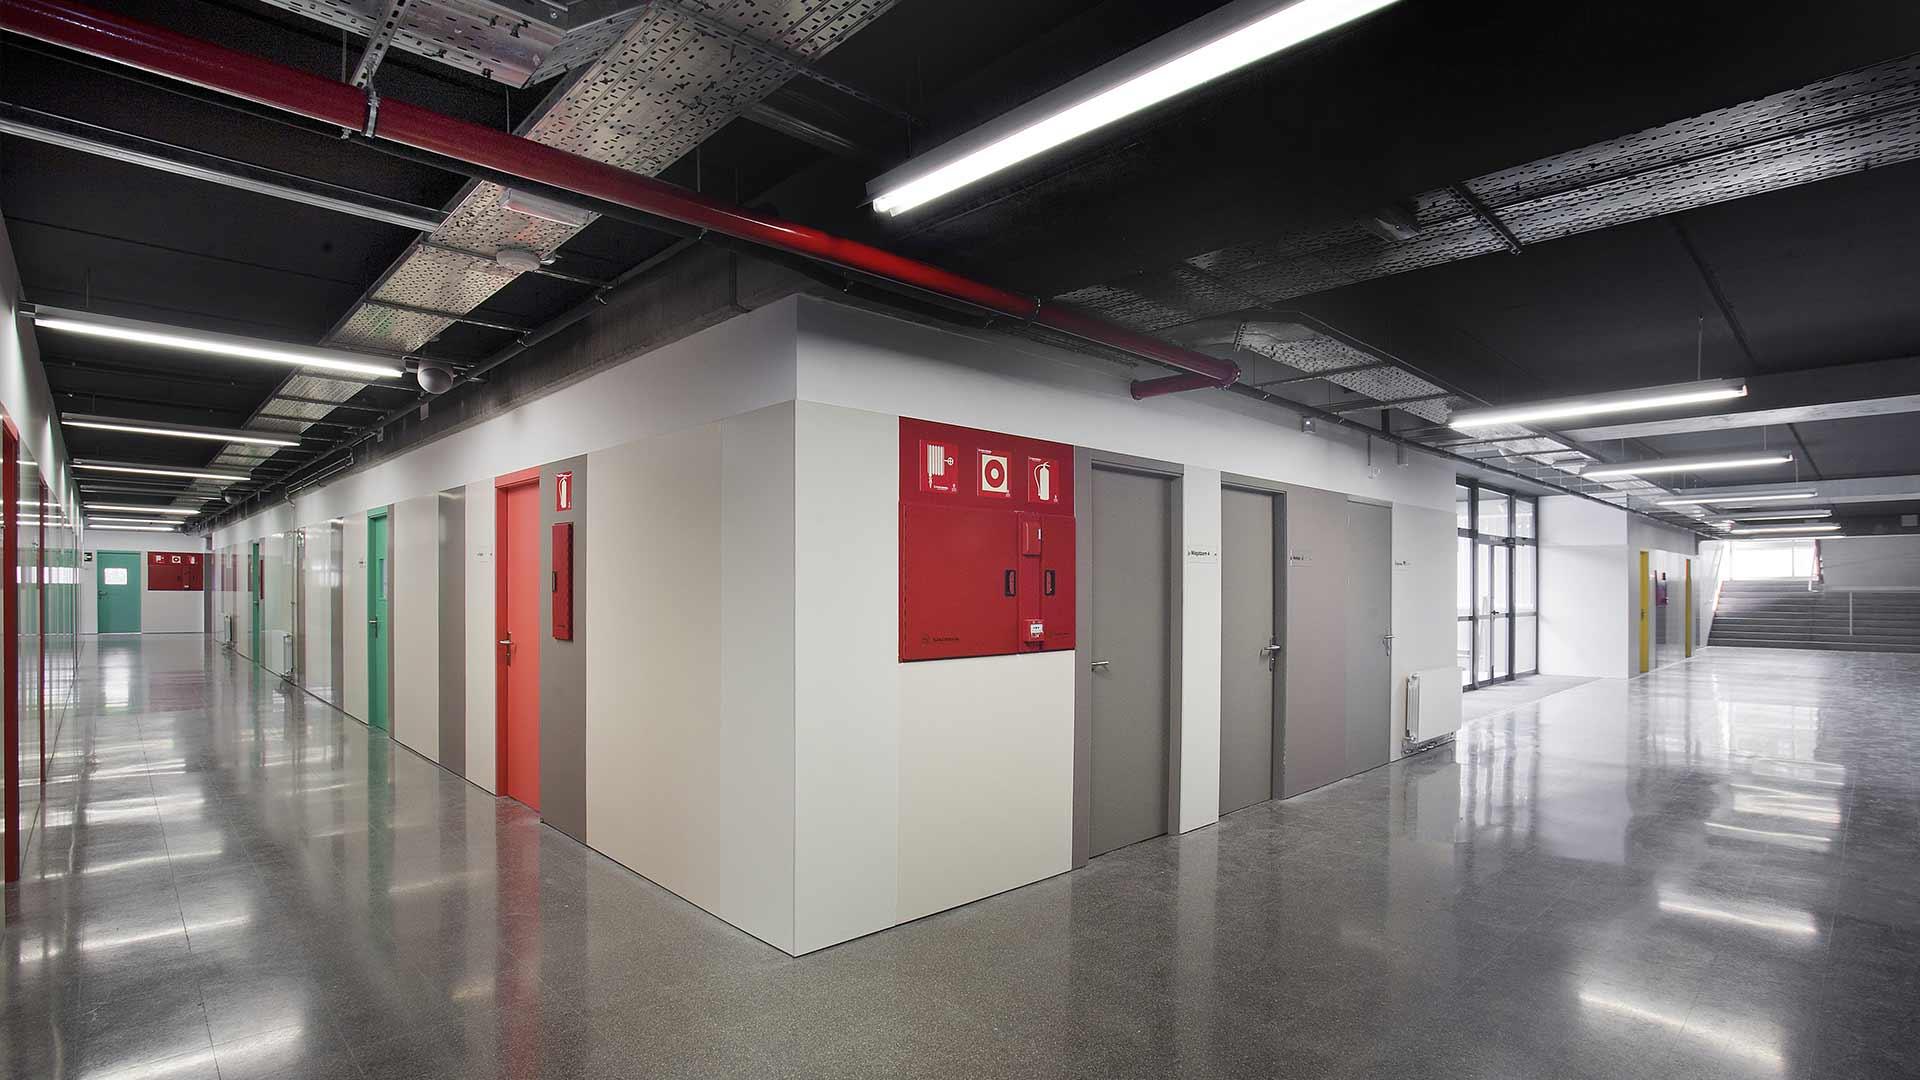 prefabricats-pujol-terratzo-paviment-escoles-montornes-1